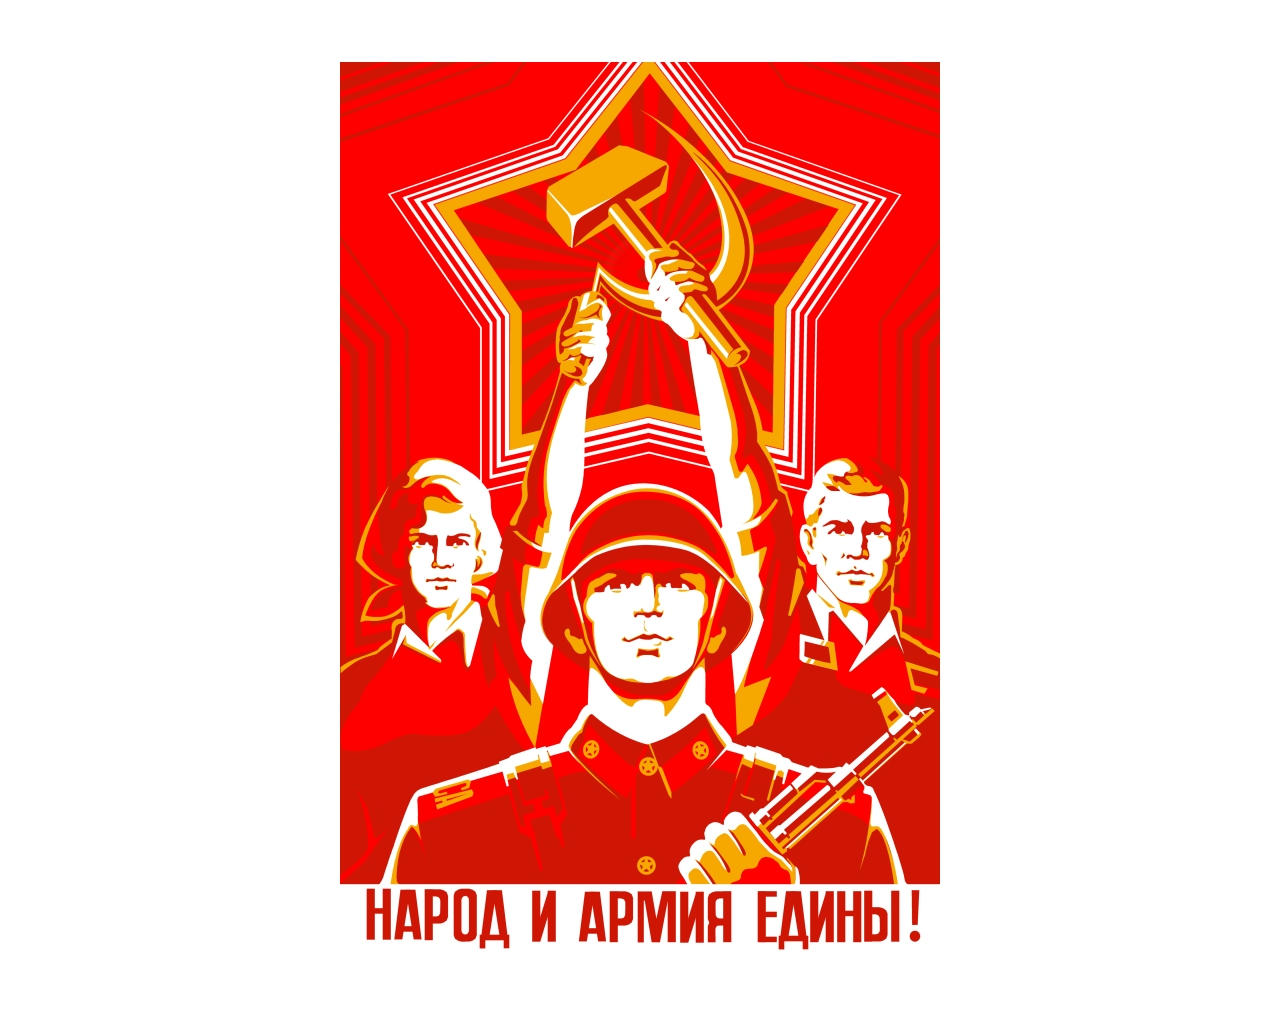 Russian Propaganda WWII by Logolotta